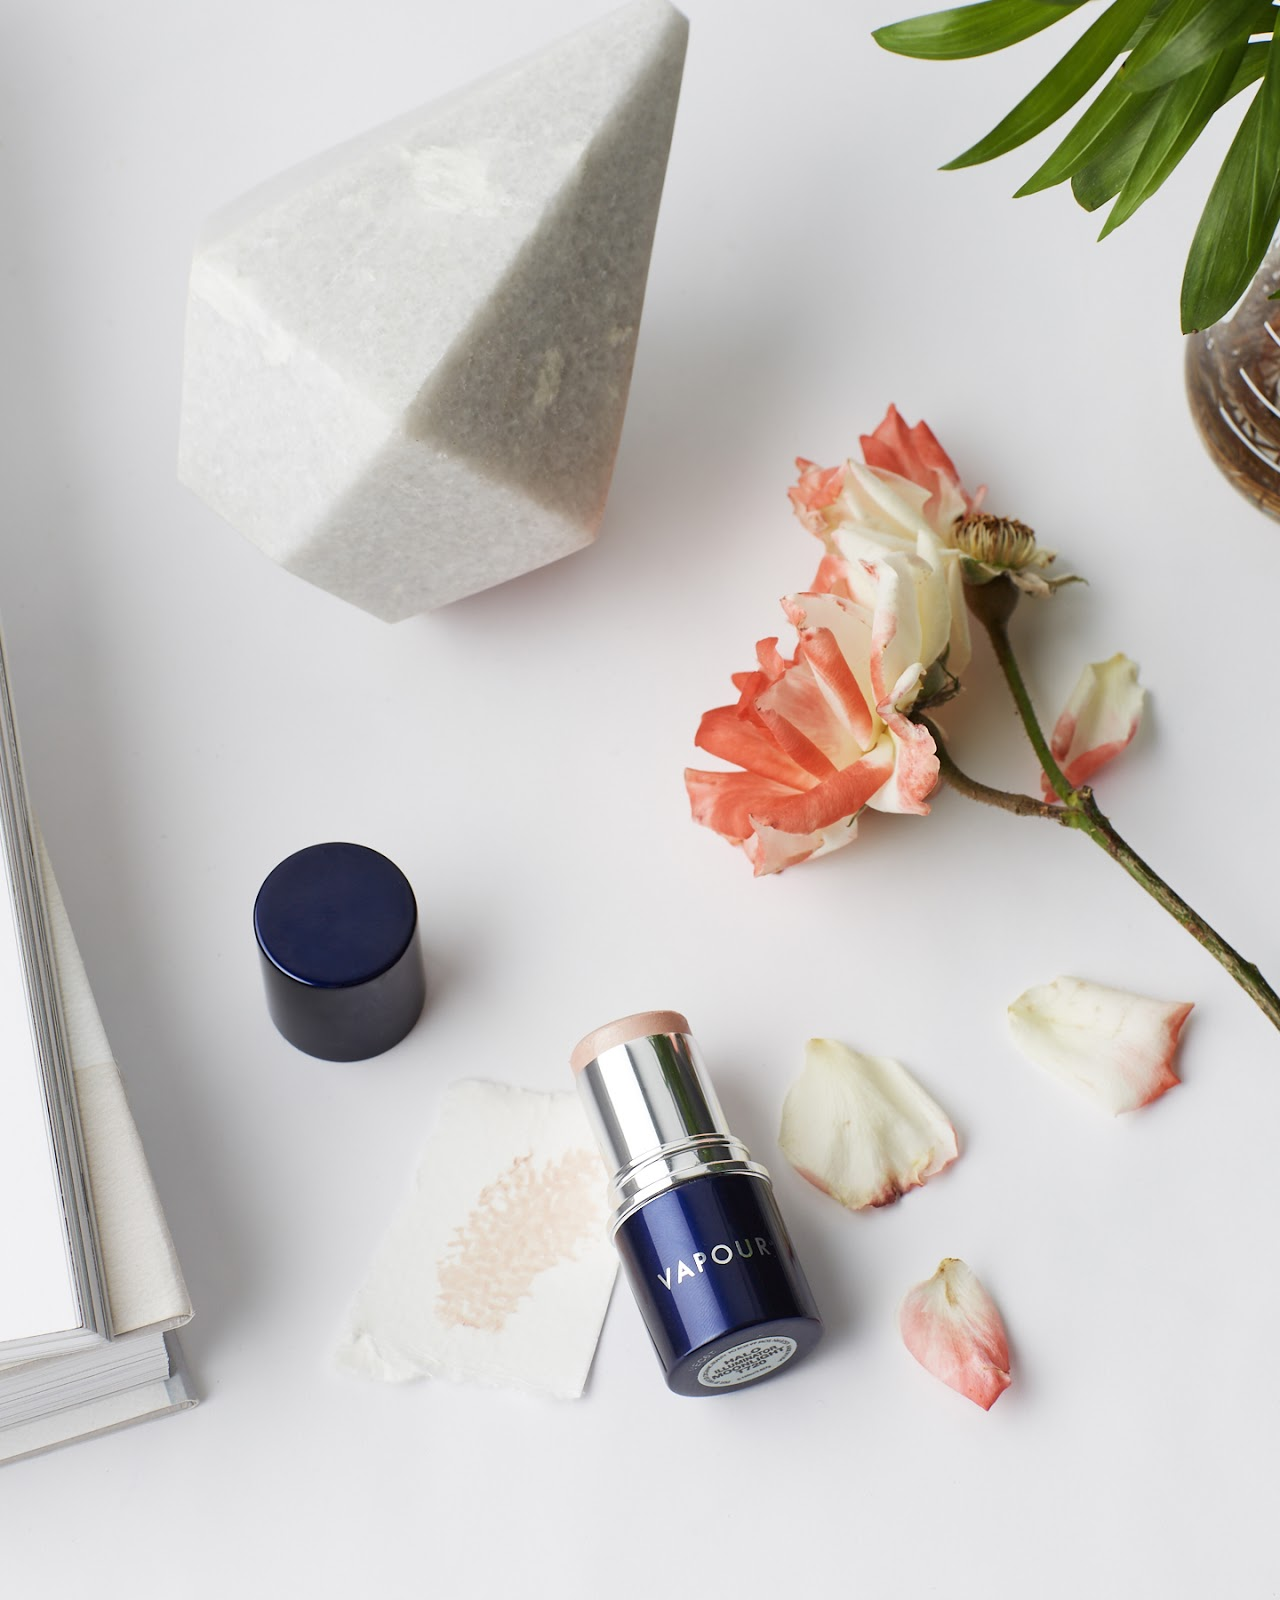 Vapour Organic Beauty Halo Illuminator swatches organic makeup brand natural nontoxic hellolindasau